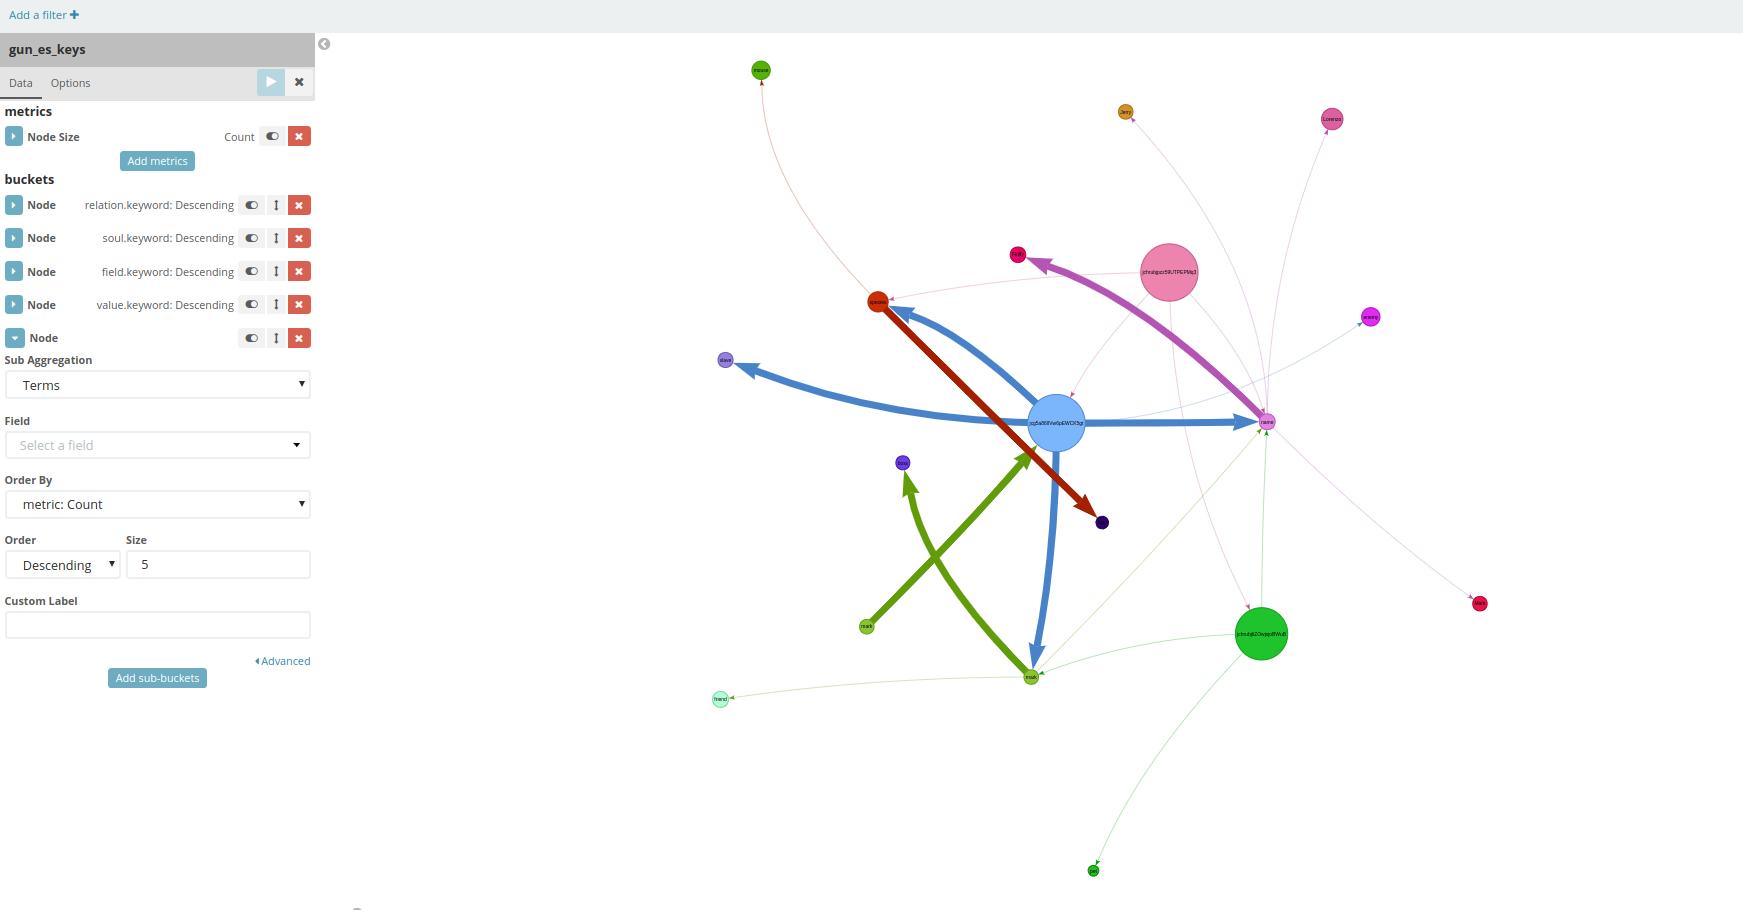 GitHub - lmangani/kibana_graph: Interactive Network Graph